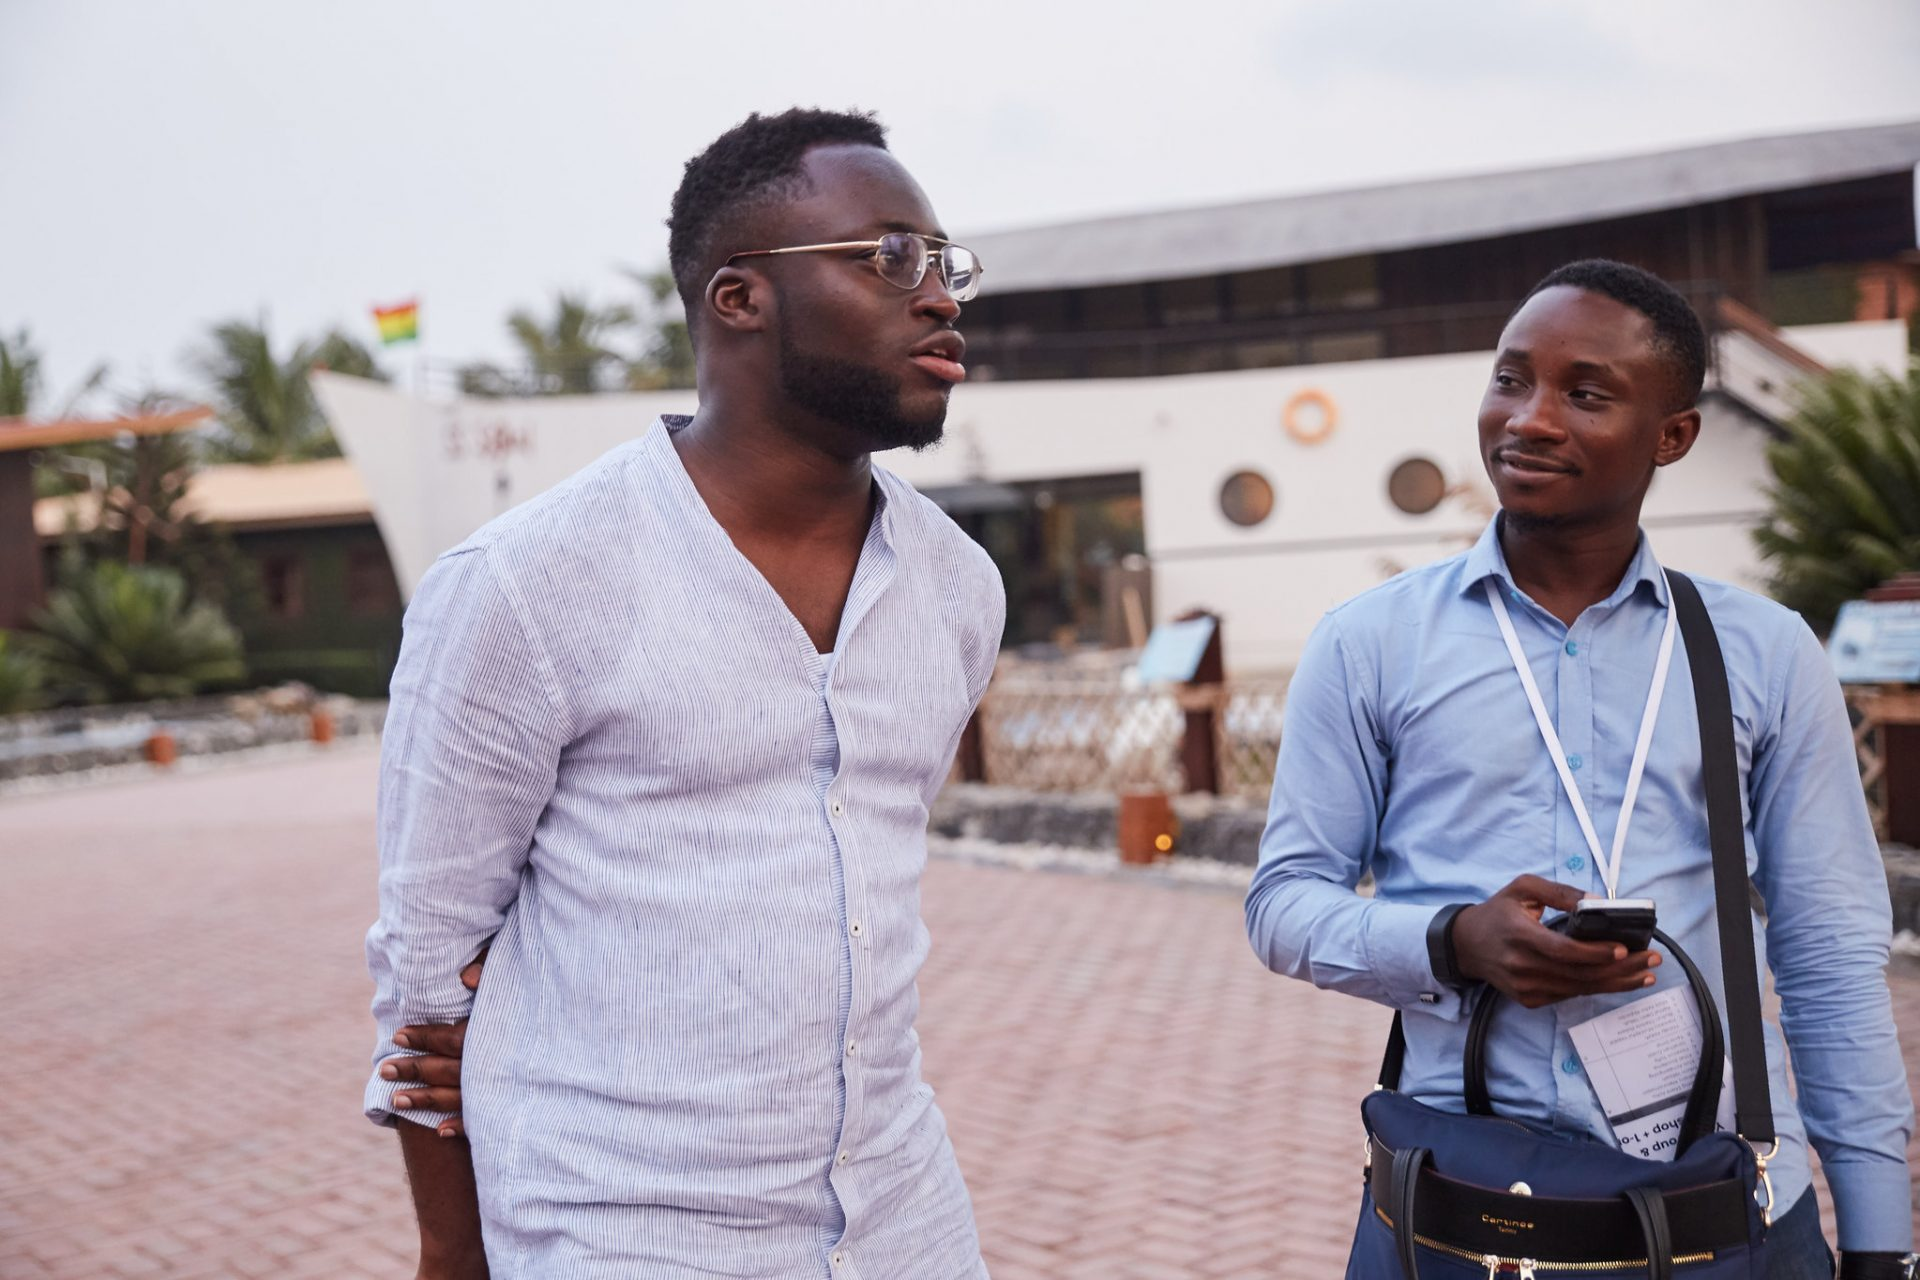 enpact_2018_West_Africa_Mentoring_Startup_Camp_Ghana